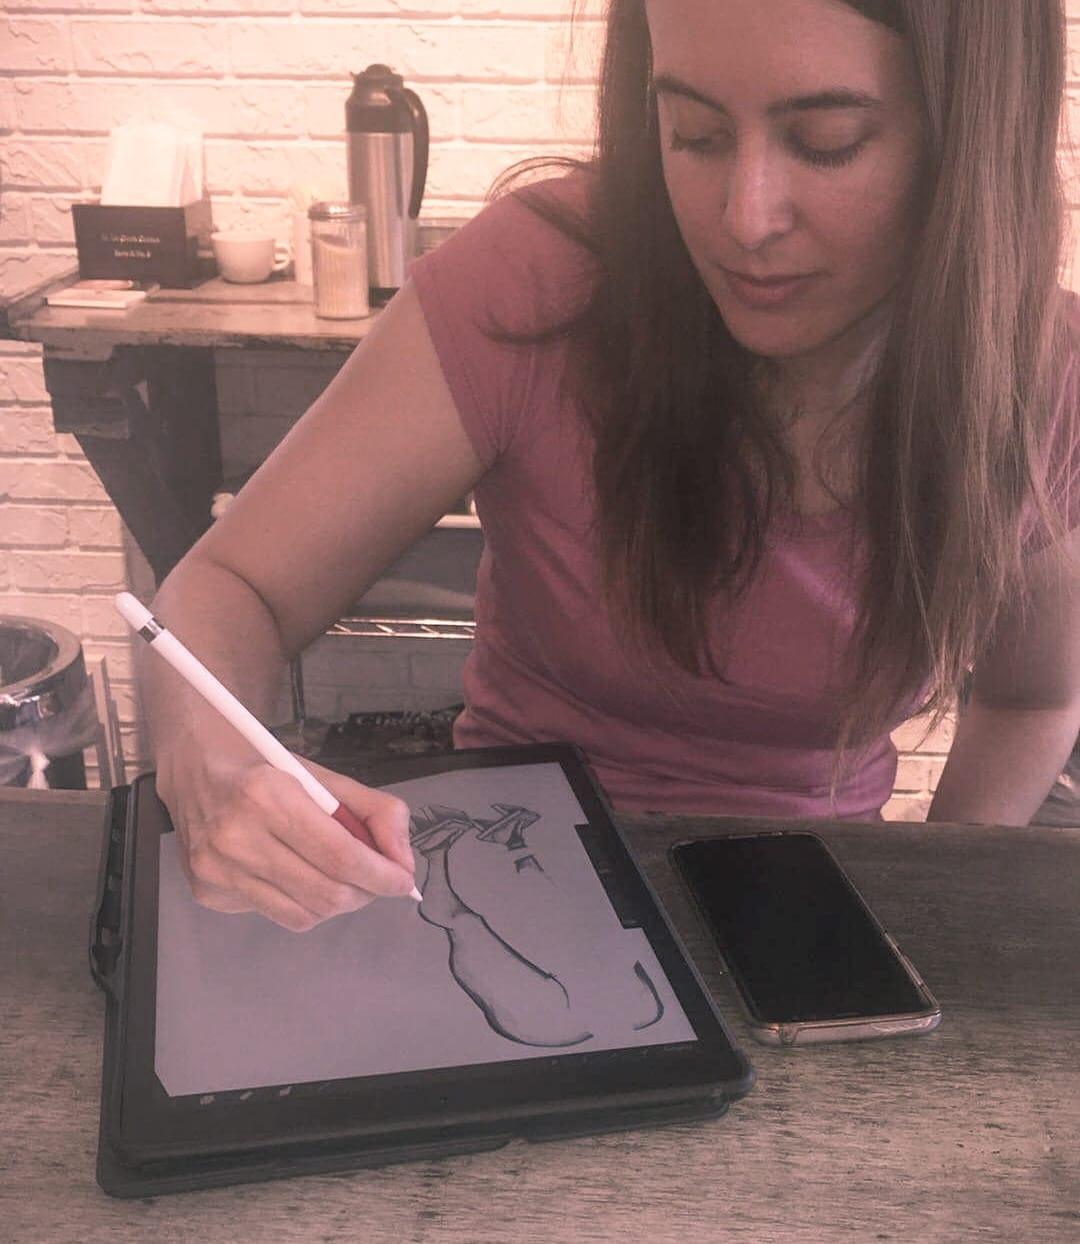 Illustrating (2019)